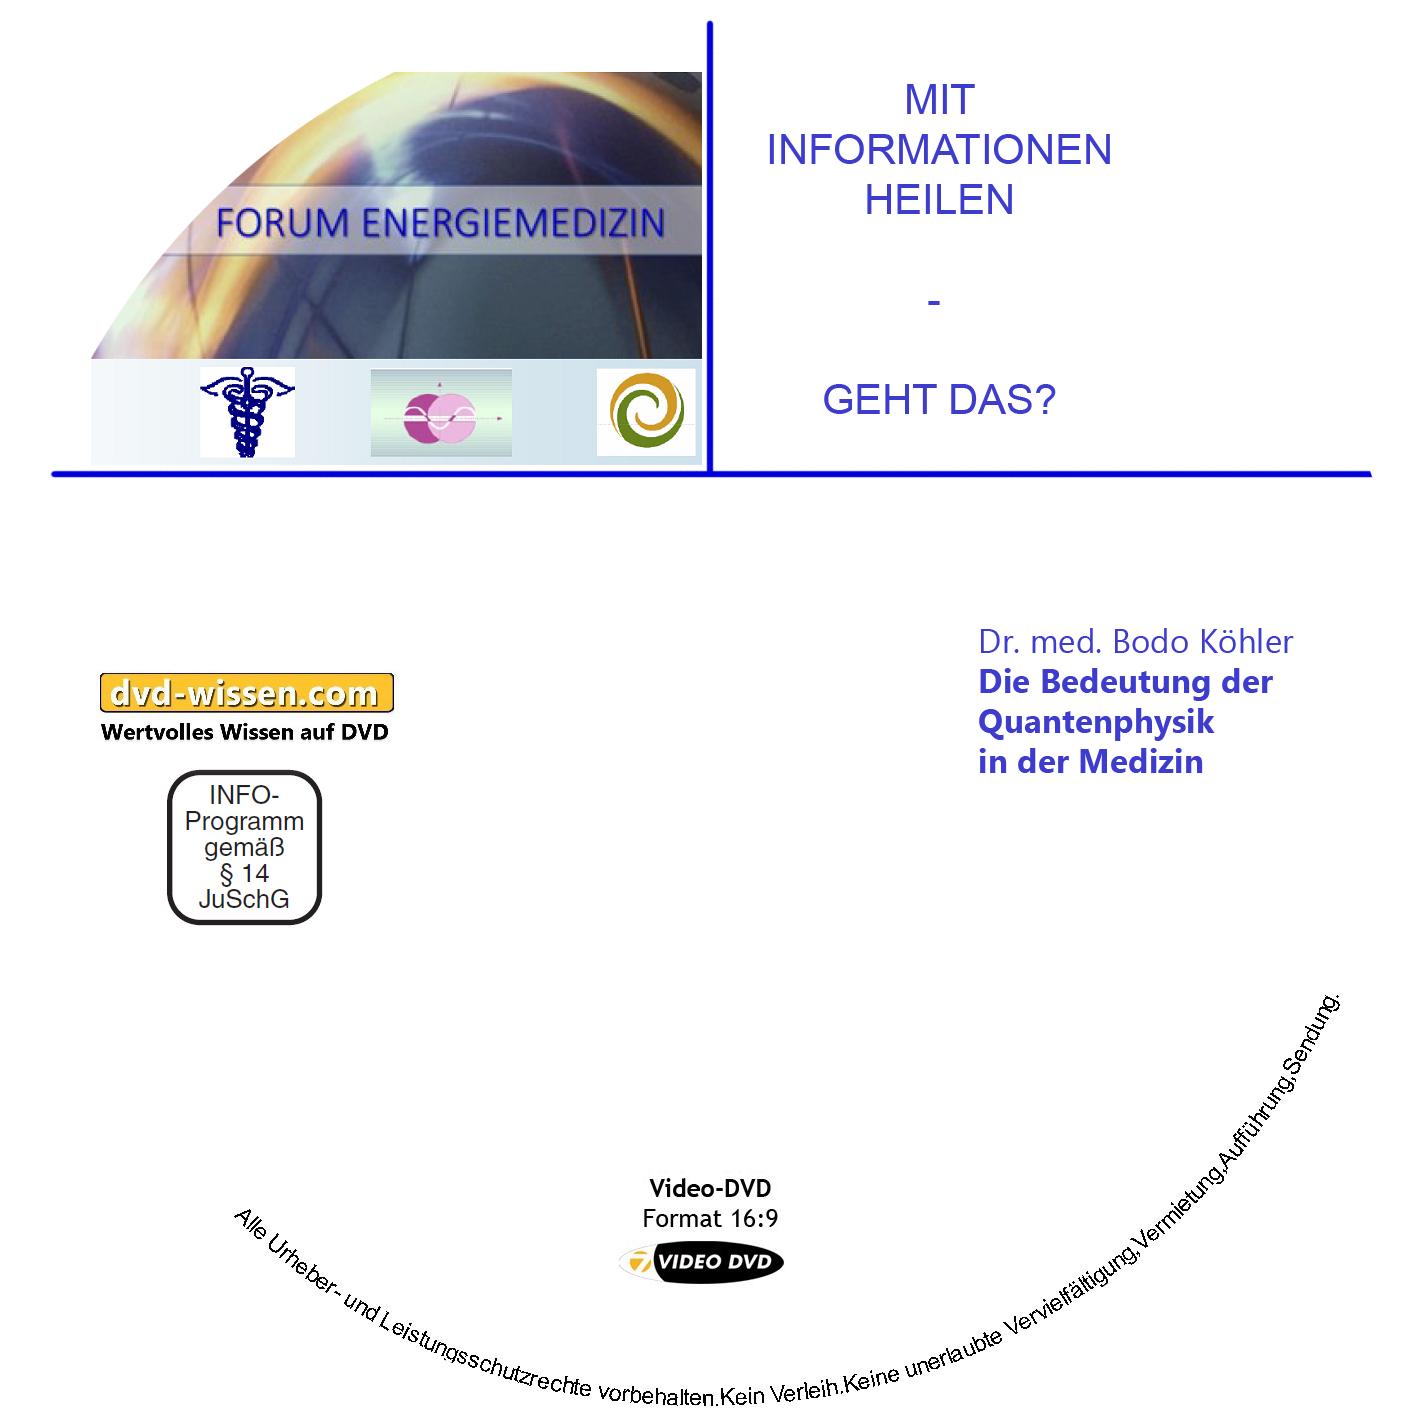 Dr. med. Bodo Köhler: Die Bedeutung der Quantenphysik in der Medizin 1 DVD-Wissen - Experten Know How